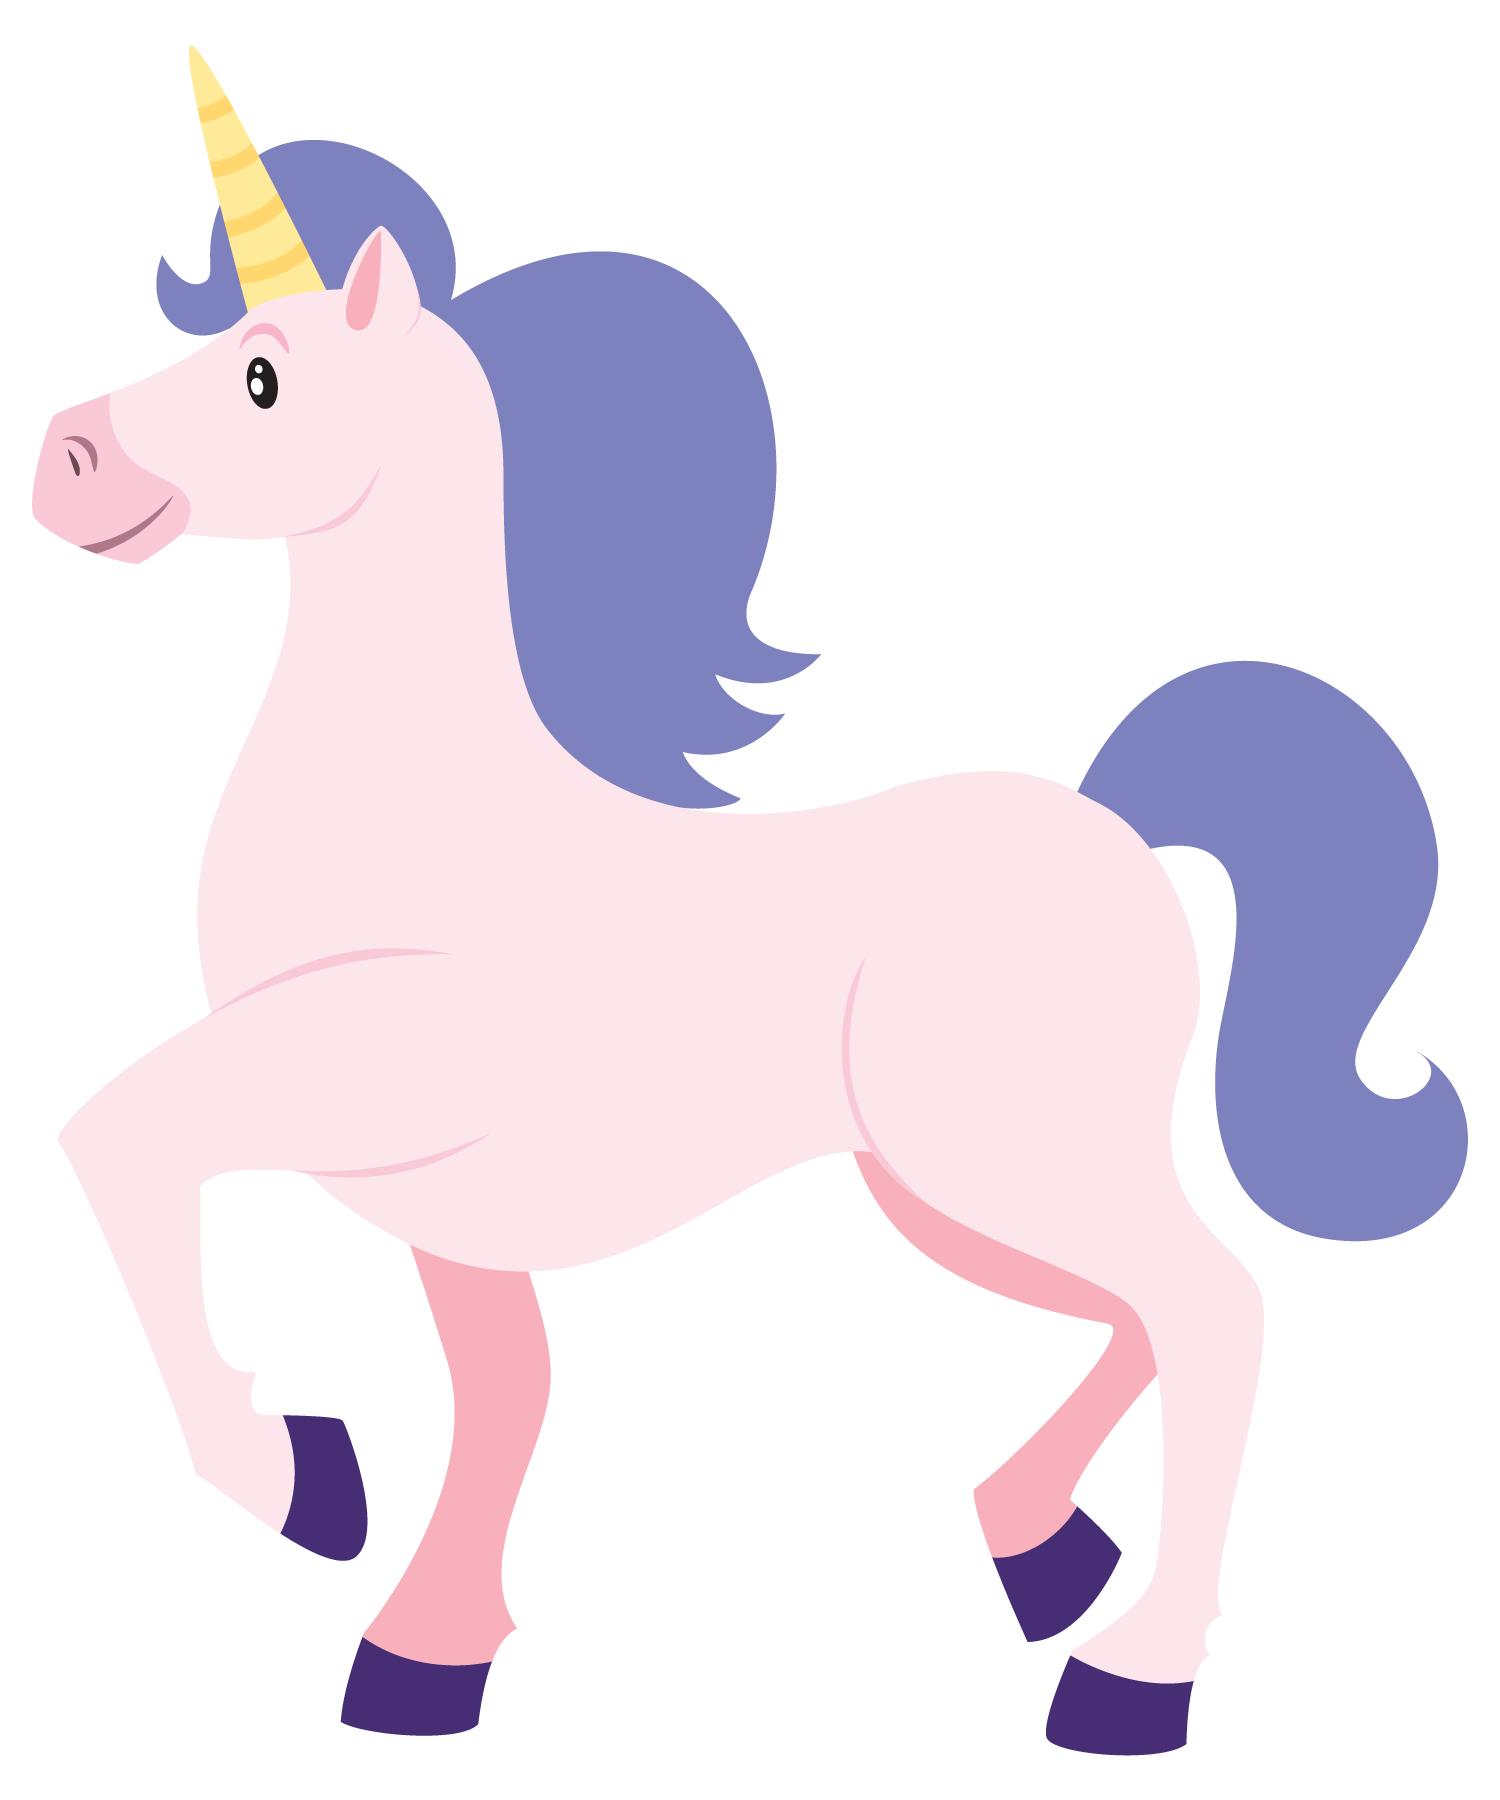 12 Unicorn Cartoon Free Cliparts That Yo-12 Unicorn Cartoon Free Cliparts That You Can Download To You-8